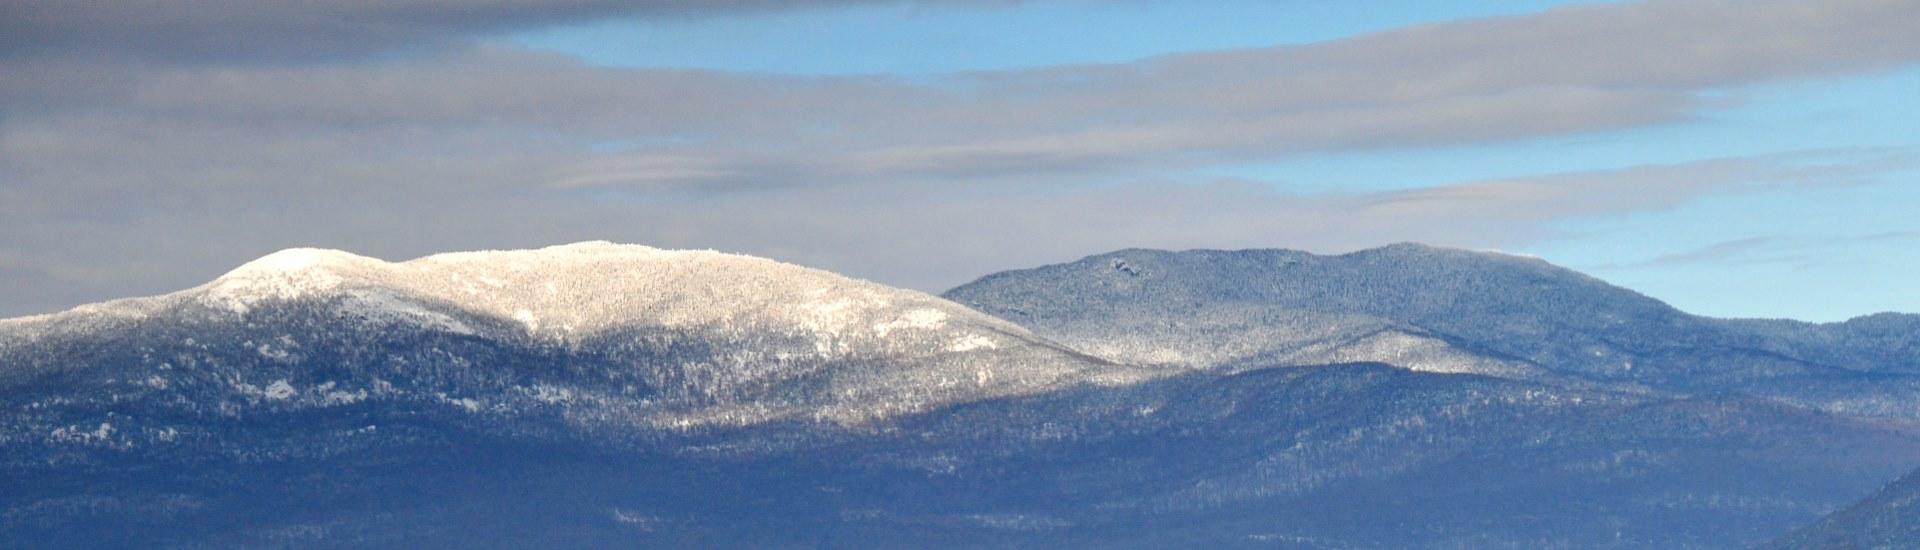 East-Montpelier-winter_website